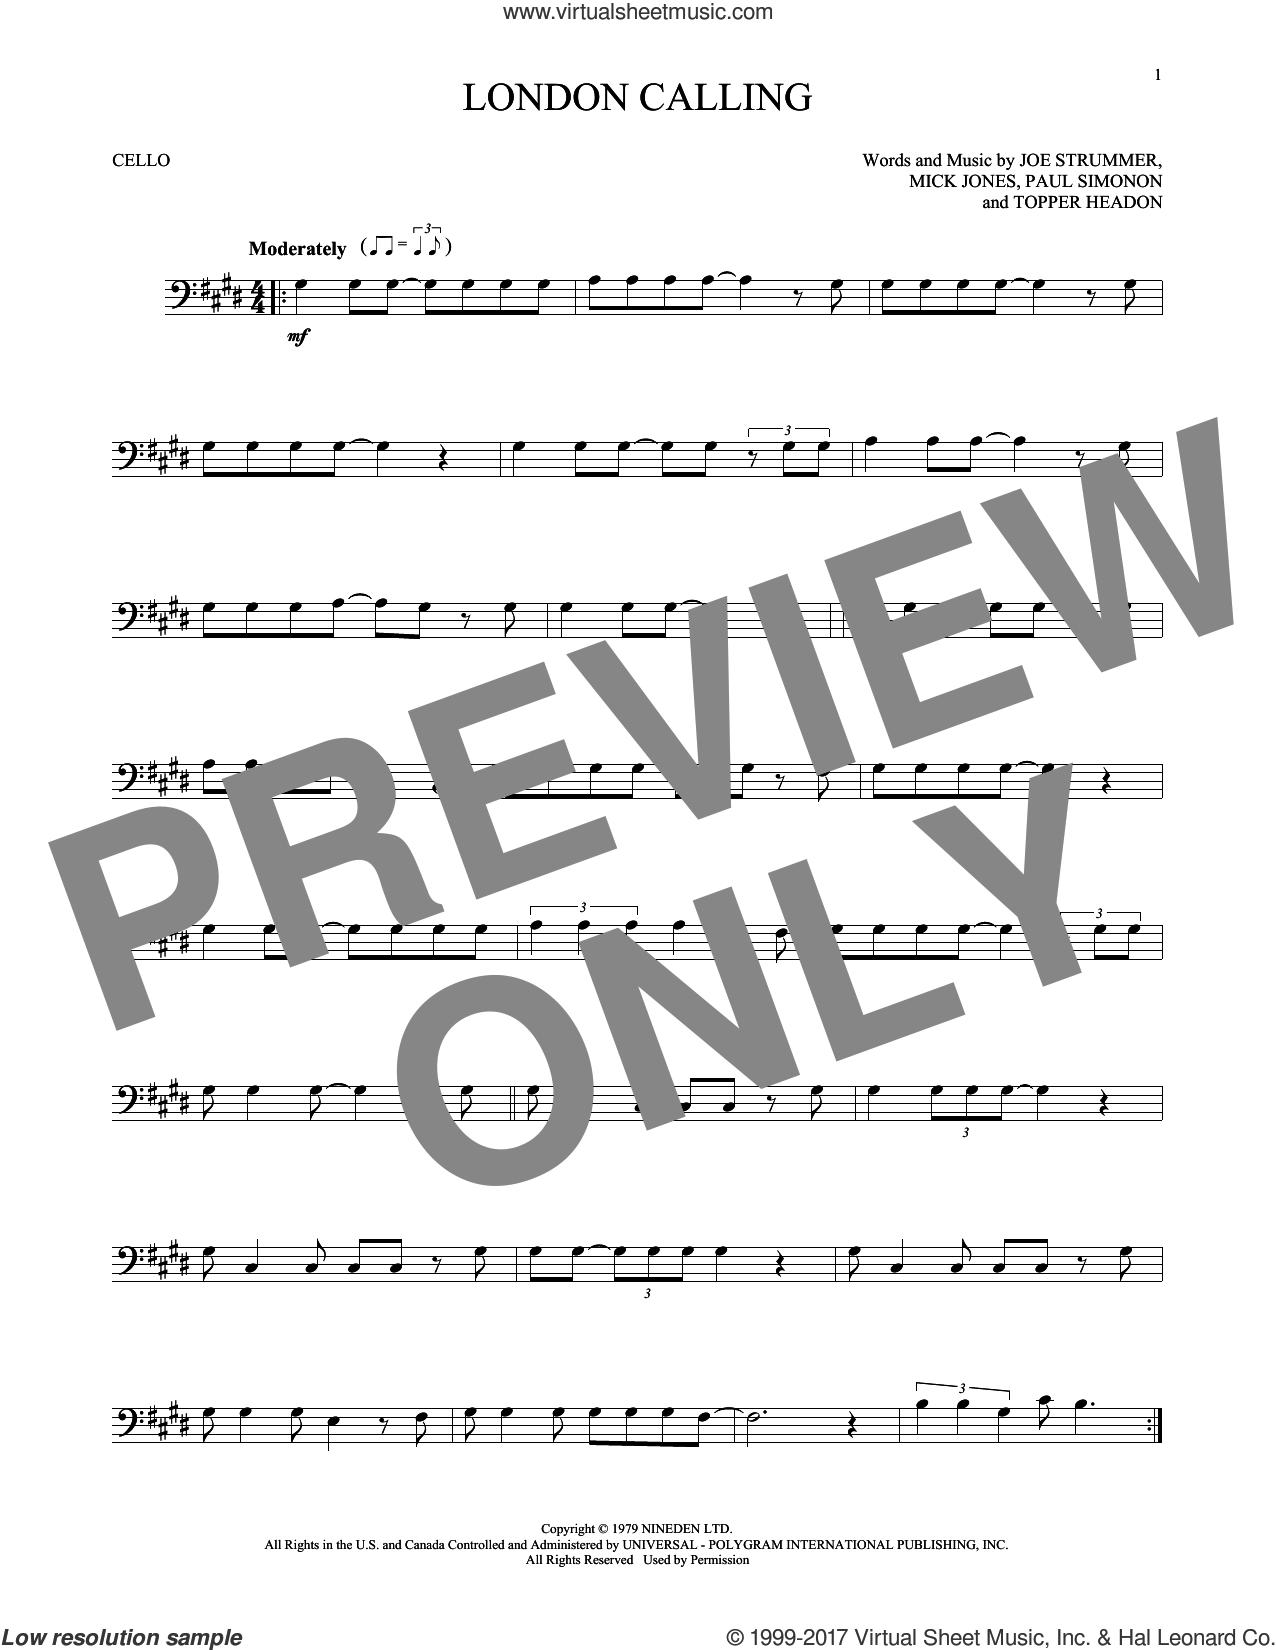 London Calling sheet music for cello solo by The Clash, Joe Strummer, Mick Jones, Paul Simonon and Topper Headon, intermediate skill level